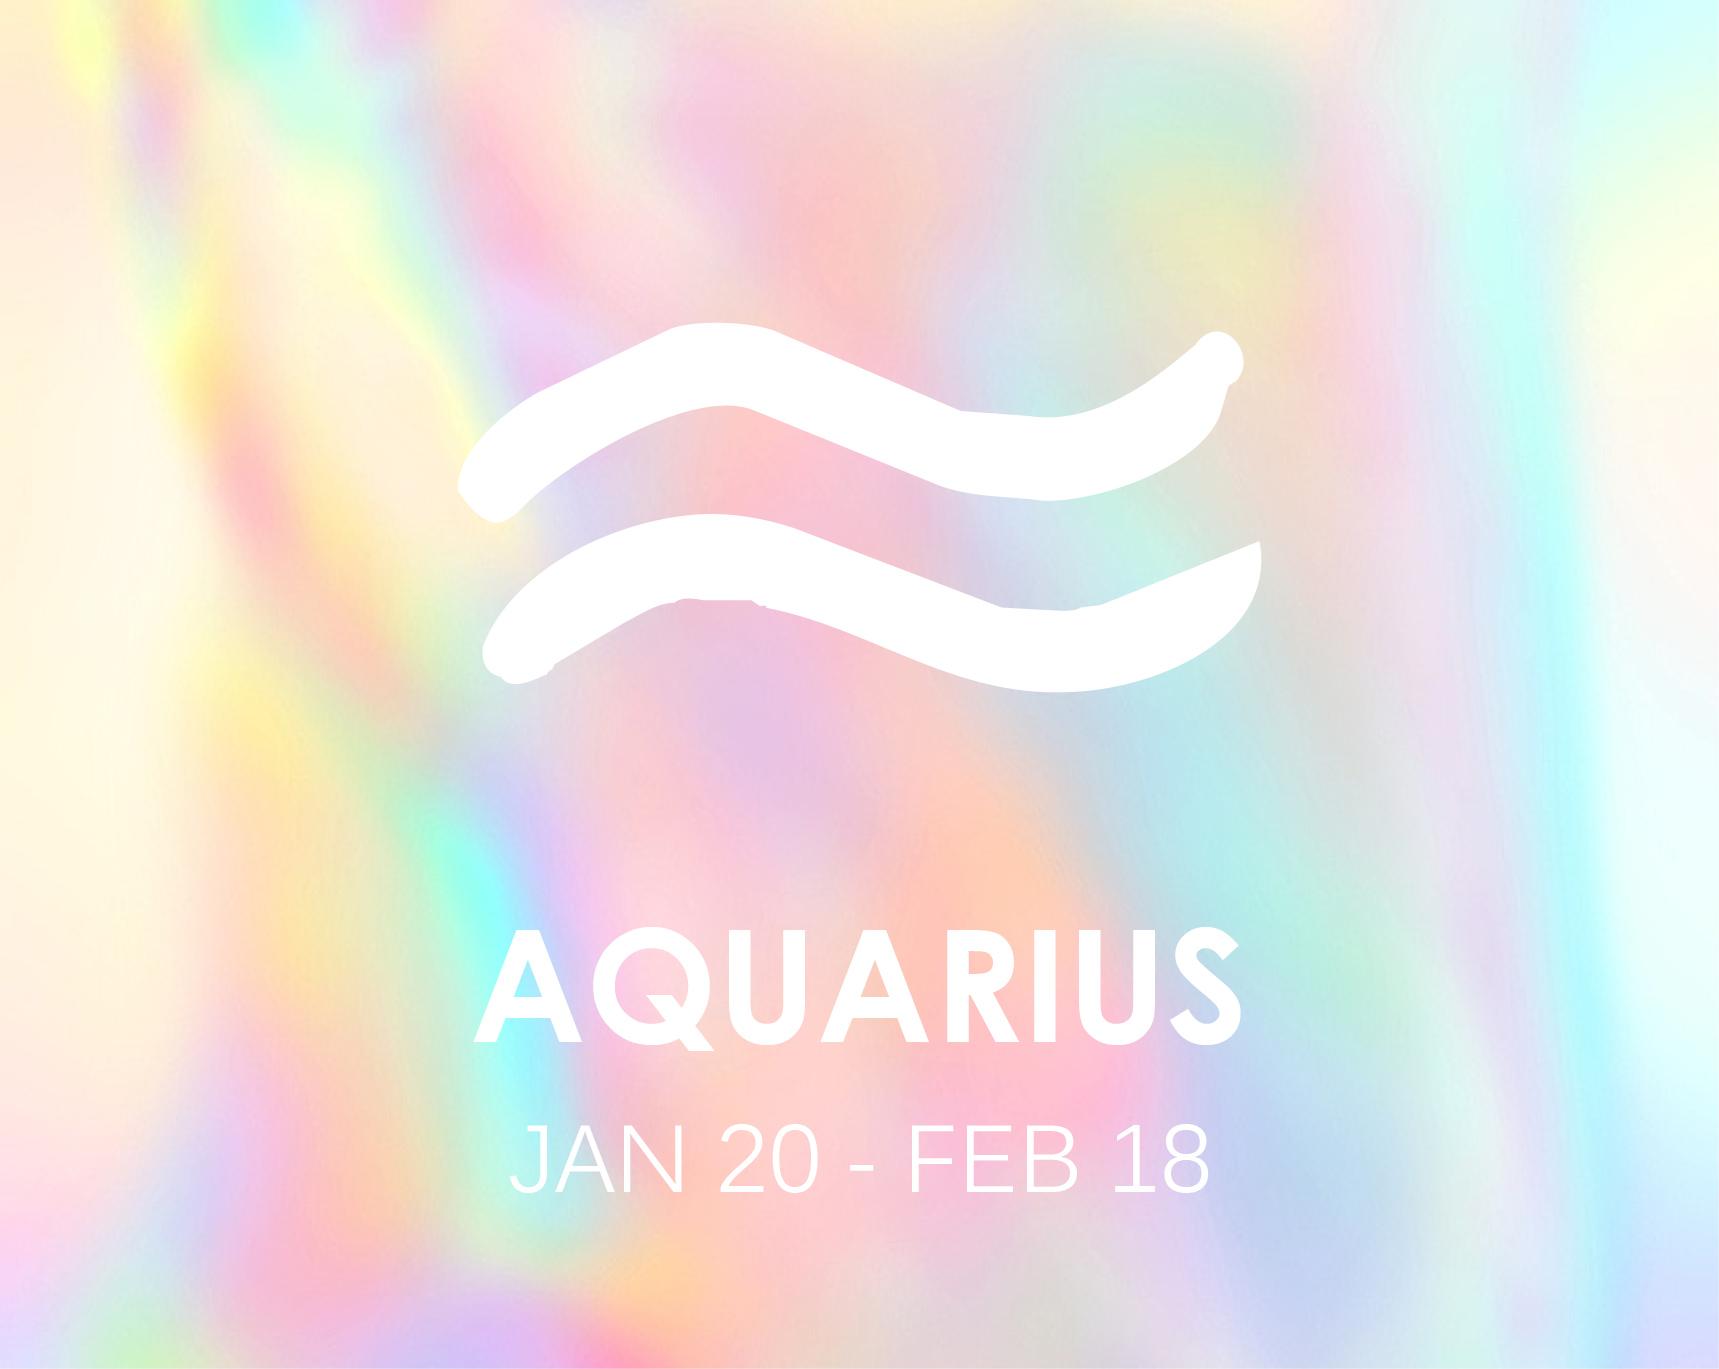 The GeniusJanuary 20th-February 18thModality:Fixed (Taurus, Leo, Scorpio + Aquarius)Element: Air (Gemini, Libra + Aquarius)Planetary Ruler: Uranus -